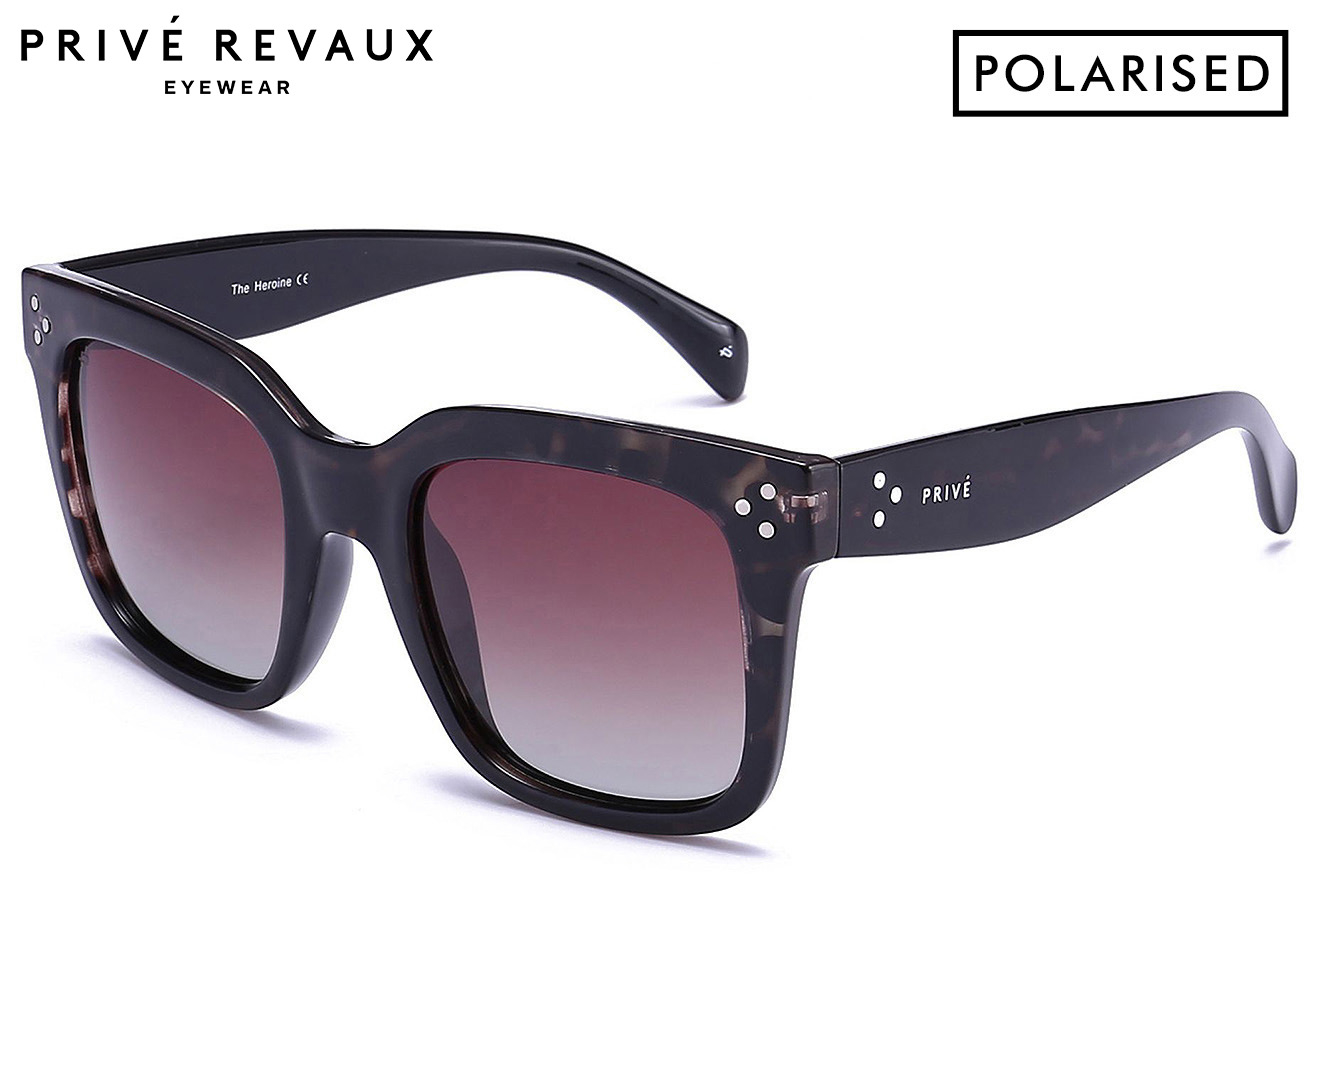 Image result for prive heroine sunglasses